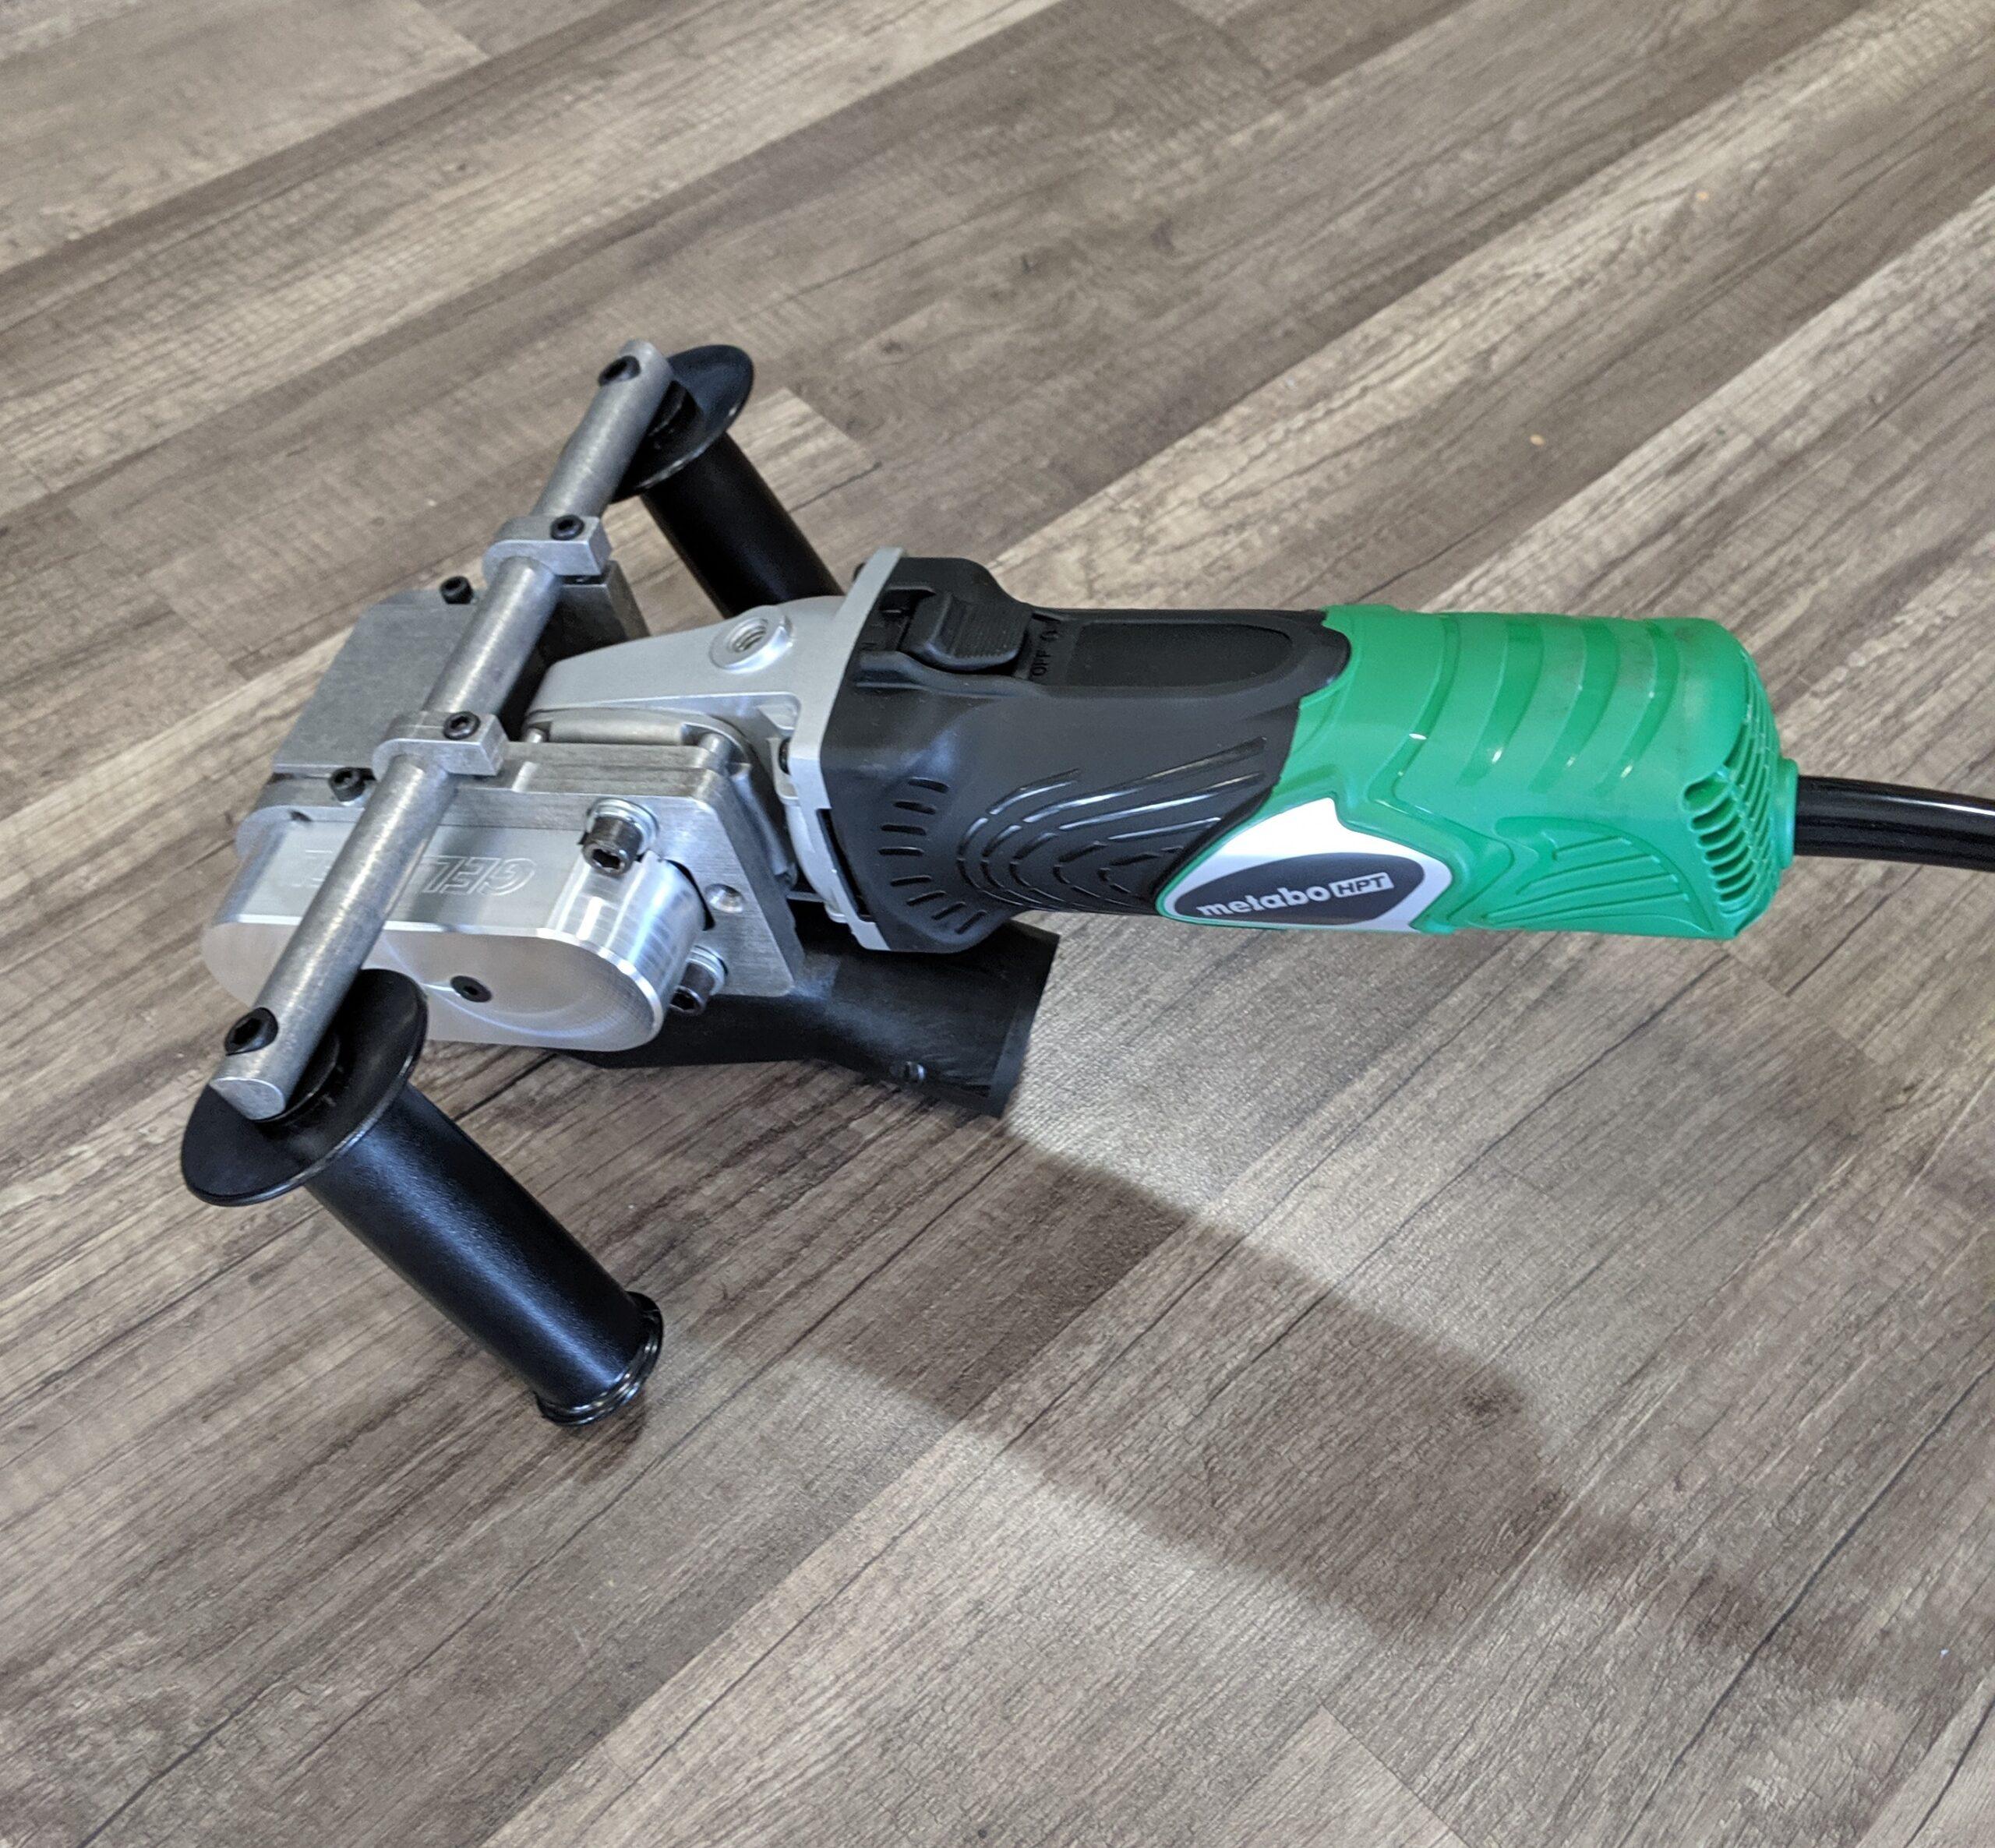 Gelpeel Pro - 120 Volts